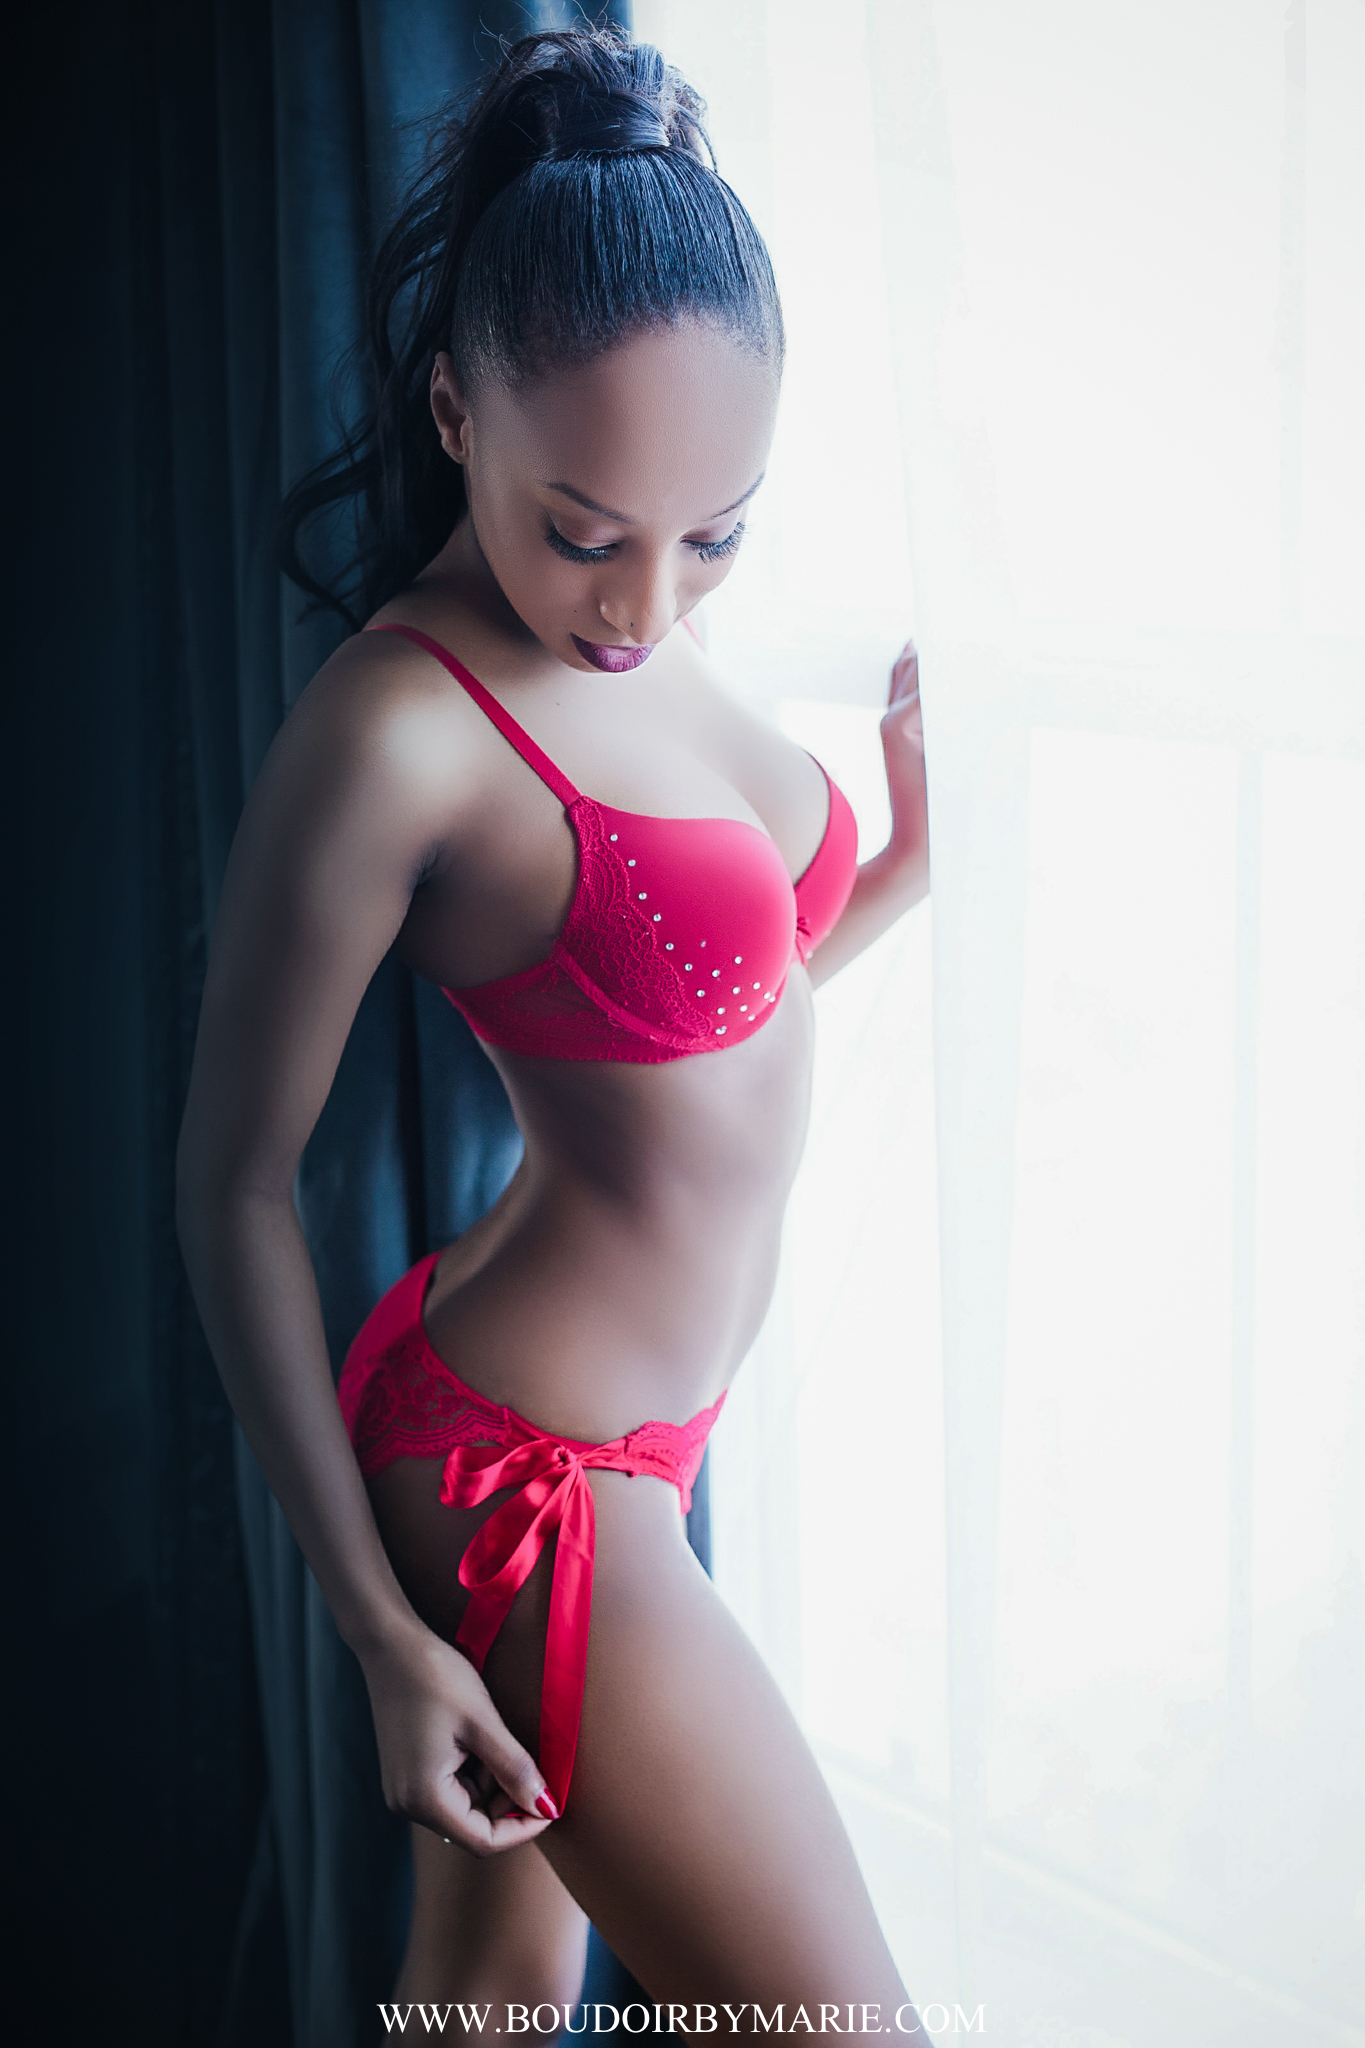 BoudoirbyMarie-MissS-12.jpg